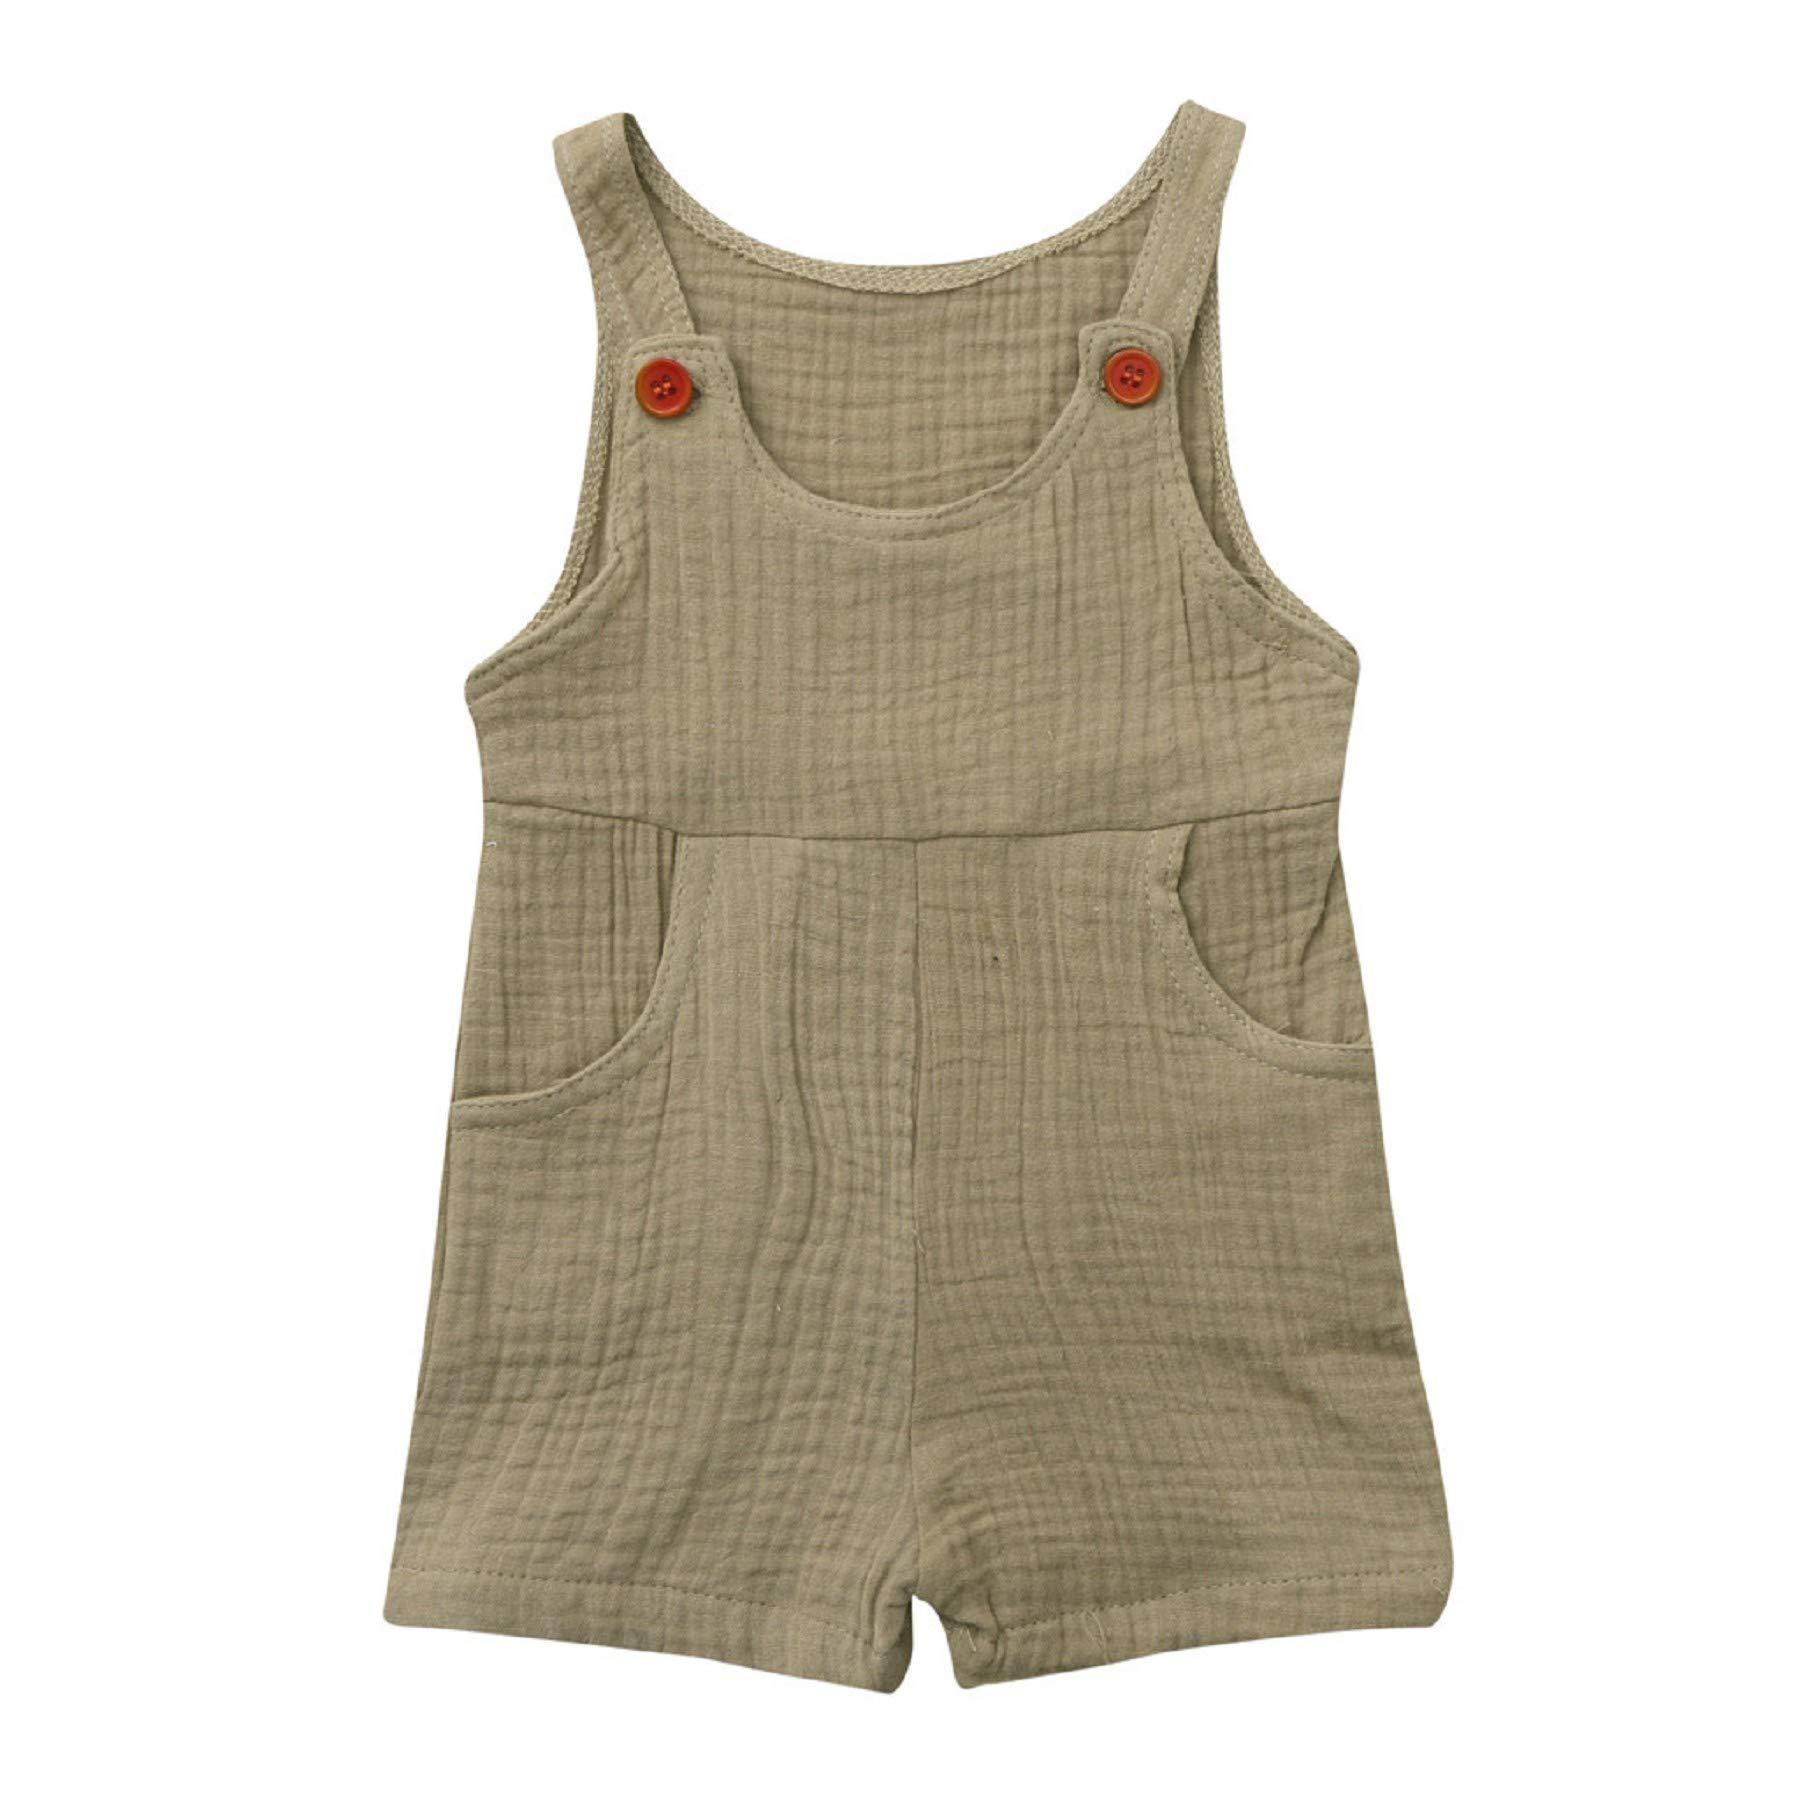 Summer Newborn Baby Boys Girls Cotton Blend Solid Overalls Romper Jumpsuit Clothes